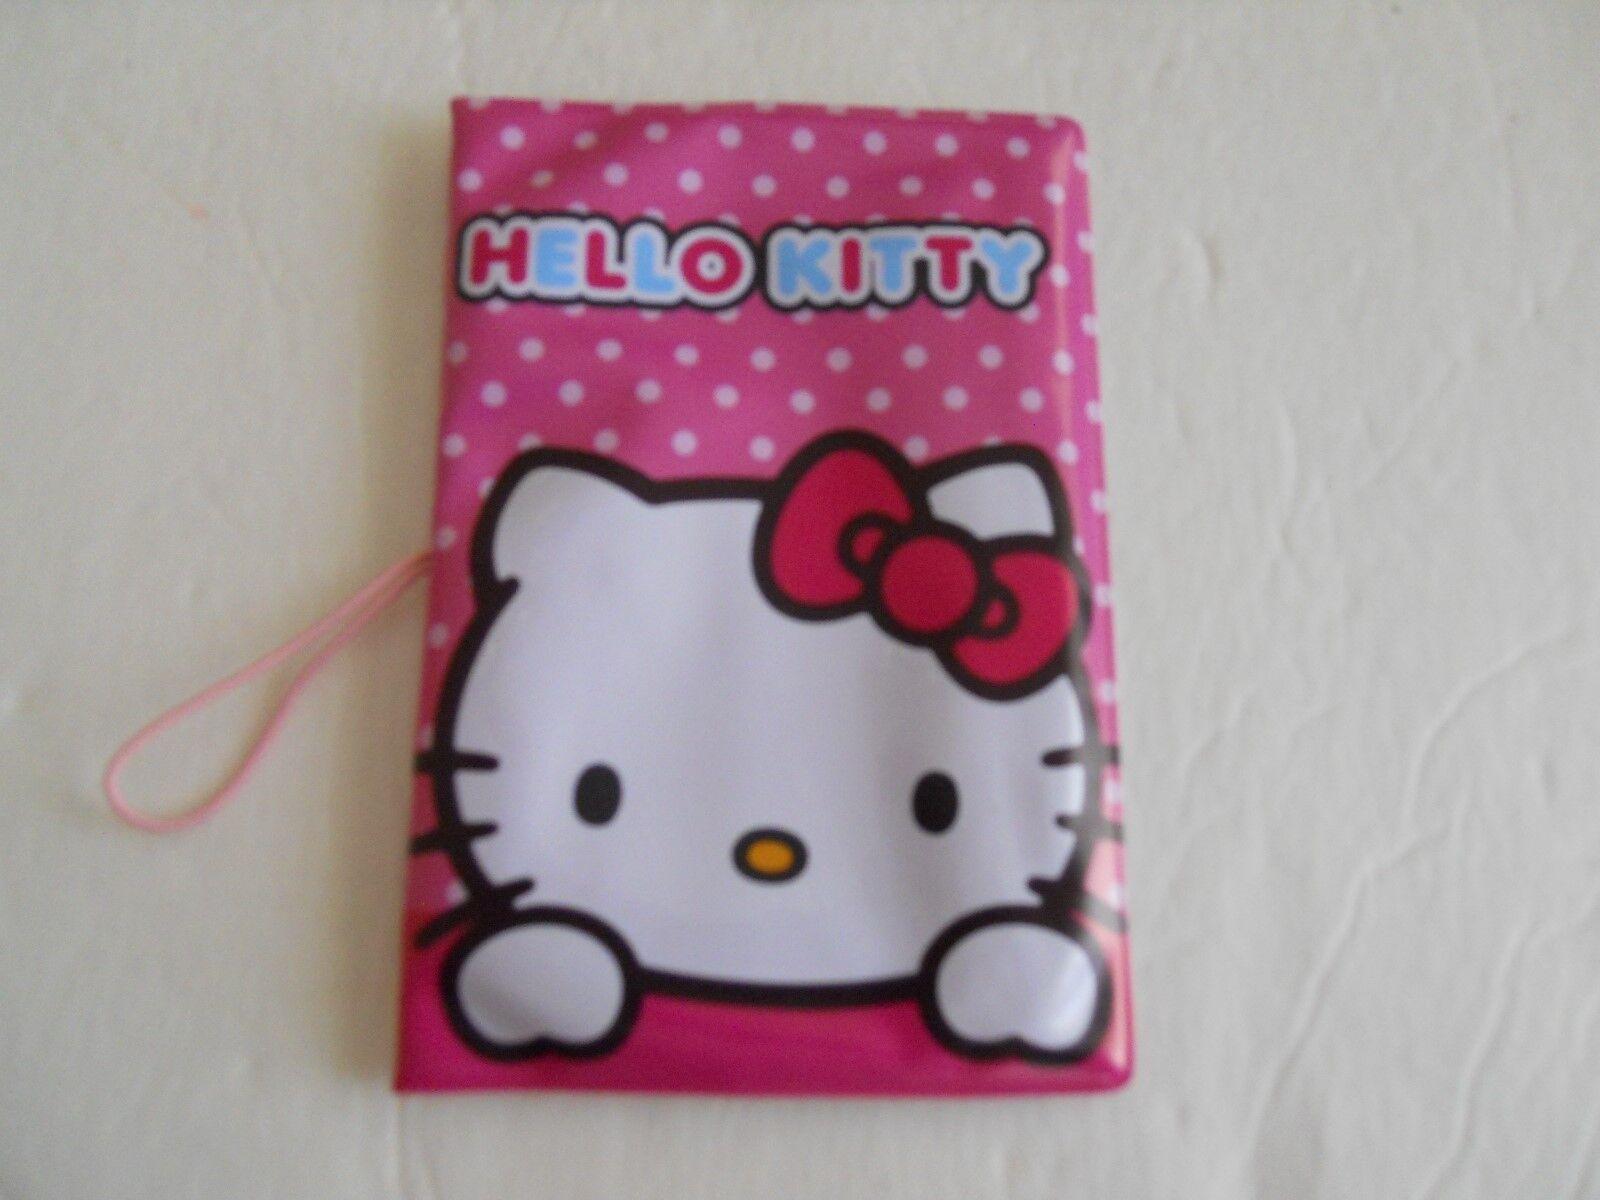 Passport ID Holder Hello Kitty Pink Case 5.25 x3.5 New - $1.00